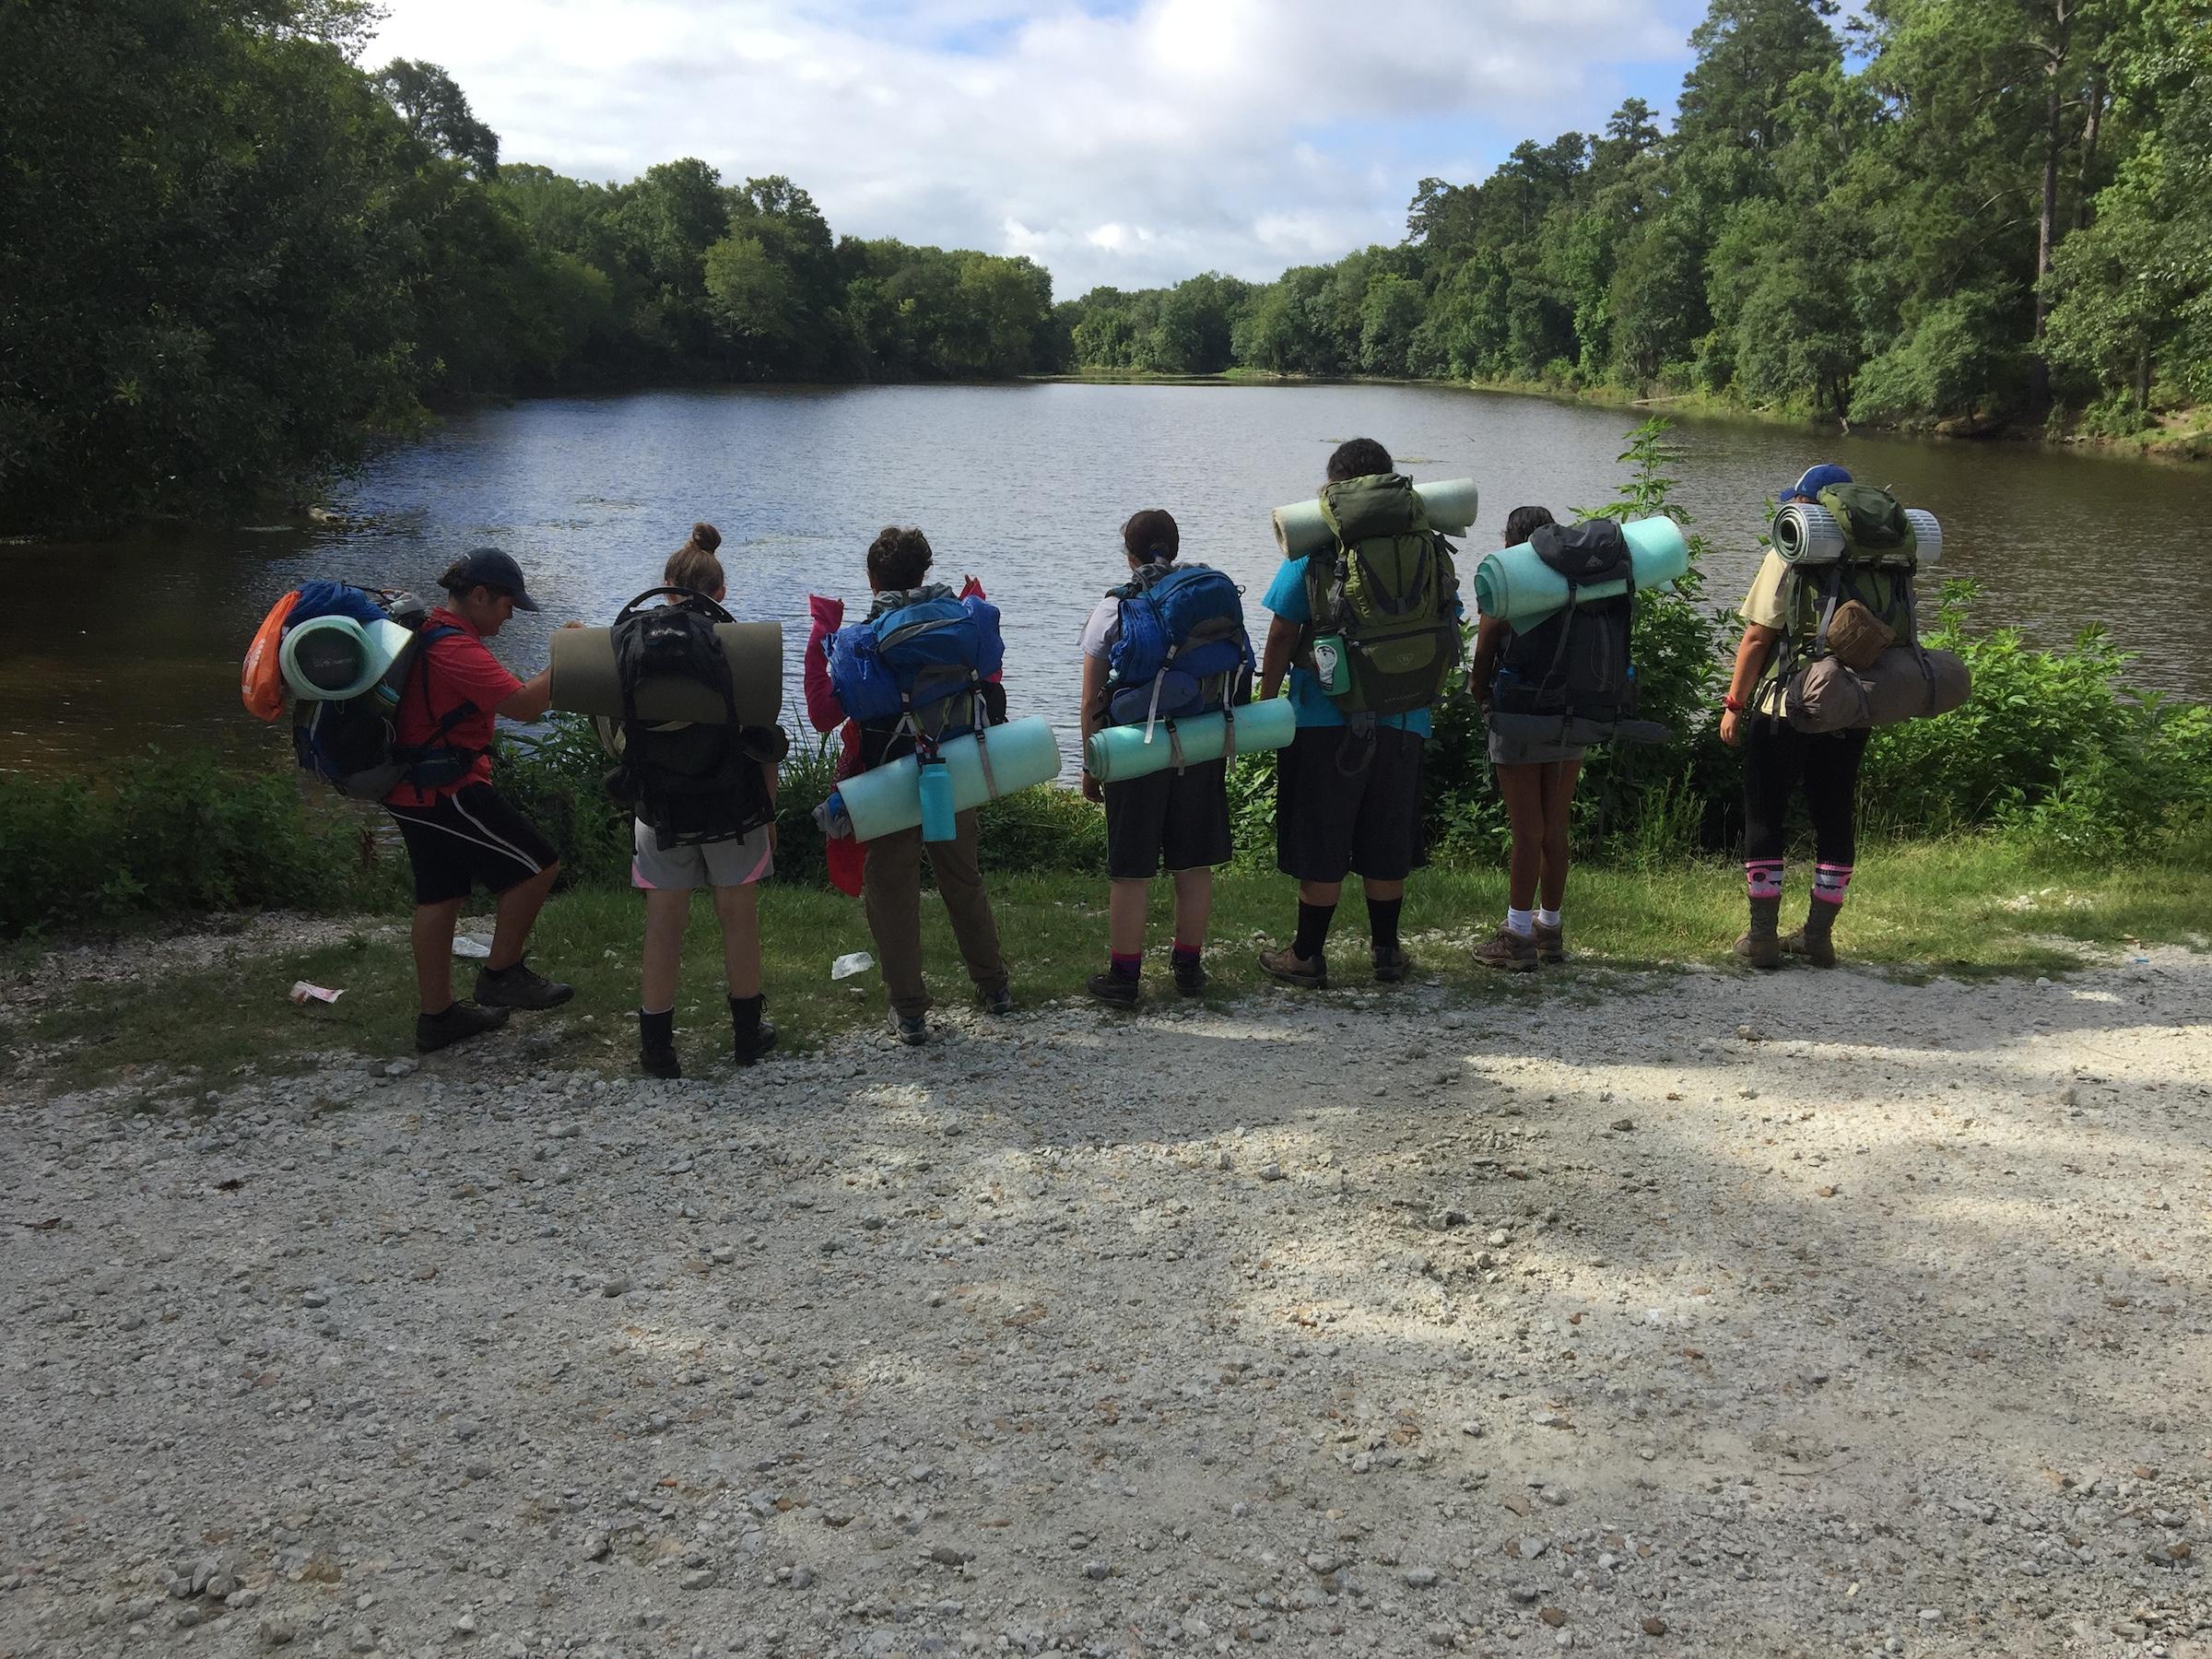 Backpacking around Lake Conroe